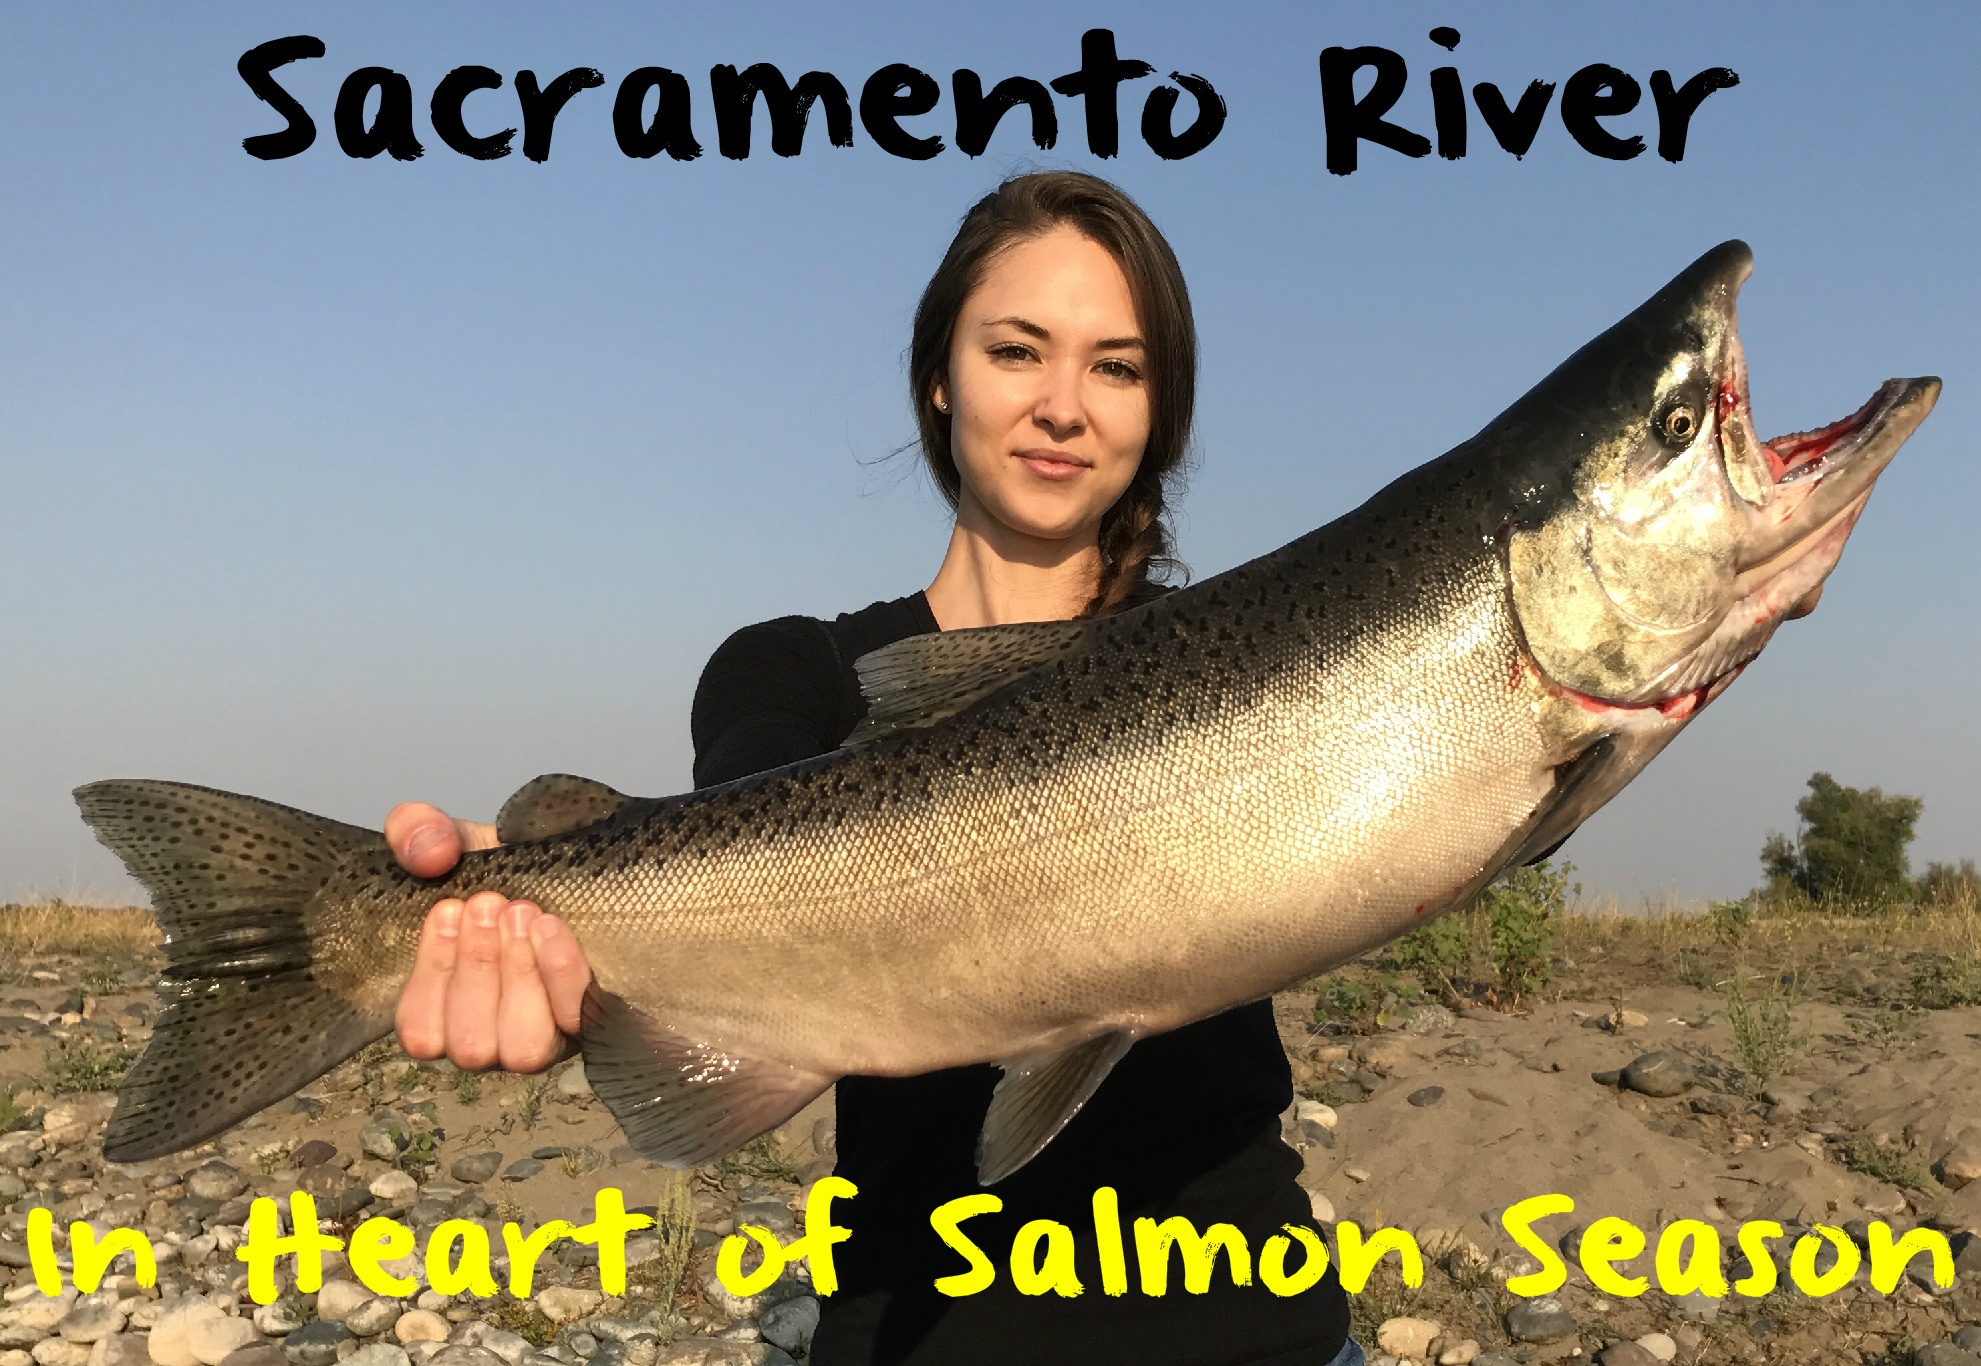 Four hot bait trolling rigs for ocean salmon fishing for Salmon fishing sacramento river